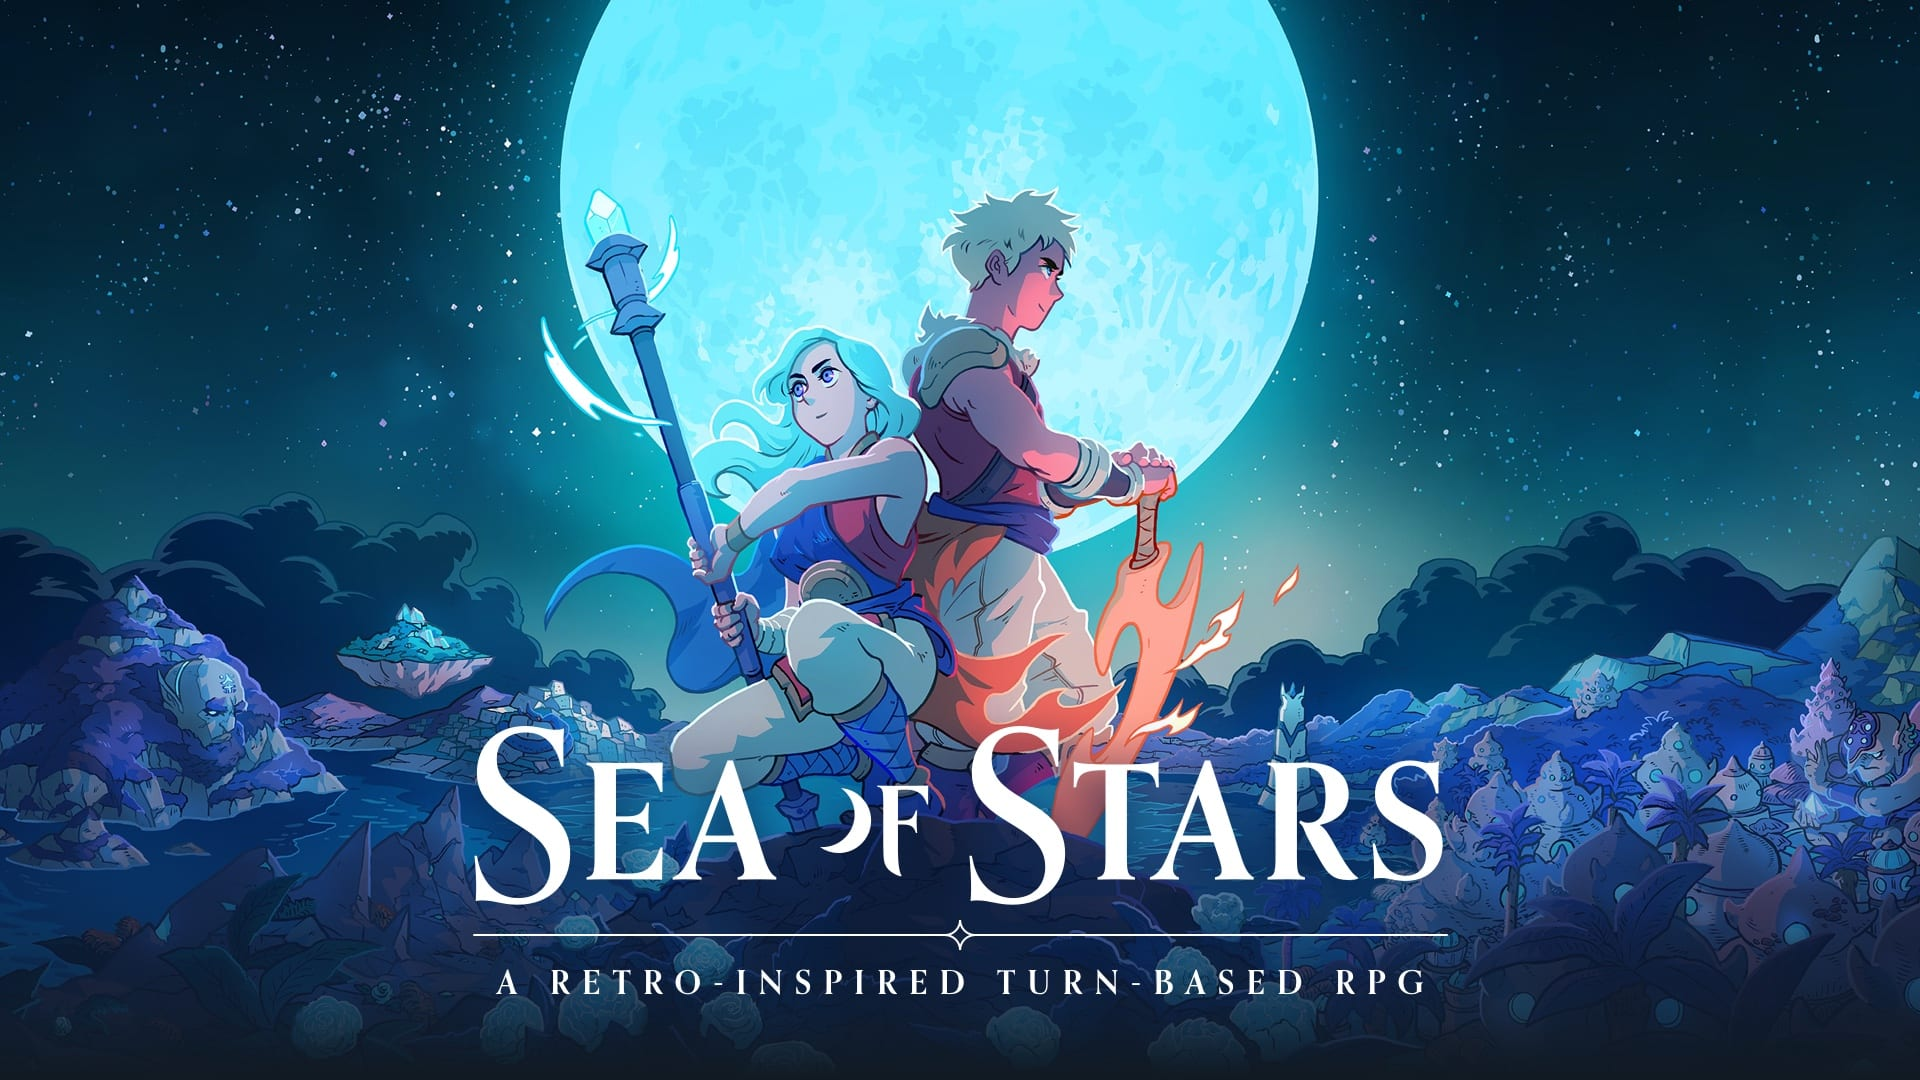 Sea of Stars Sabotage Studio Kickstarter RPG The Messenger